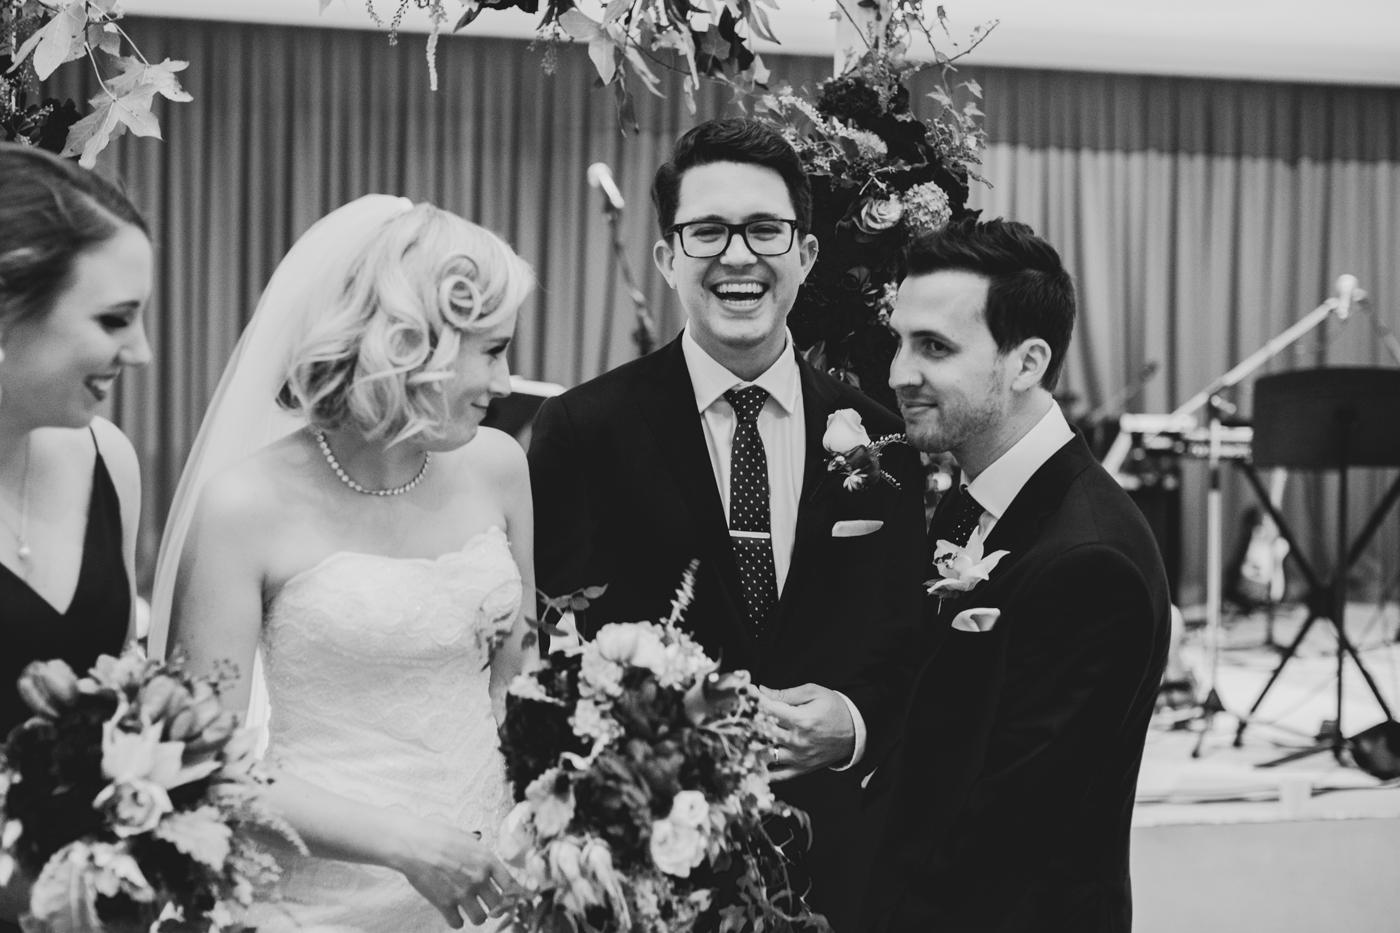 Jo & Tom Wedding - The Grounds of Alexandria - Samantha Heather Photography-149.jpg